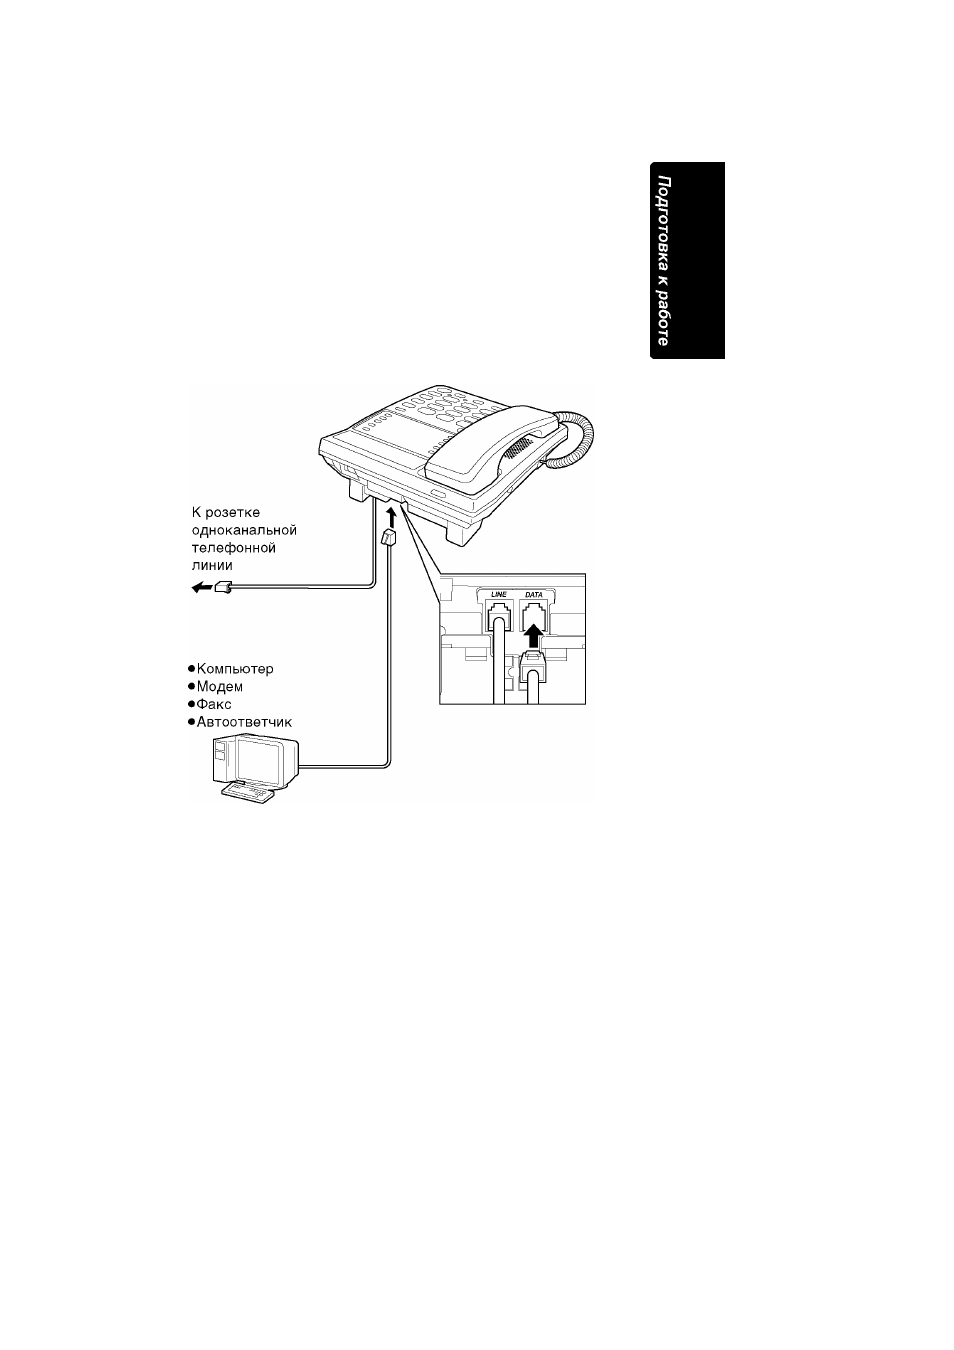 Panasonic Kx Ts2363ruw инструкция на русском